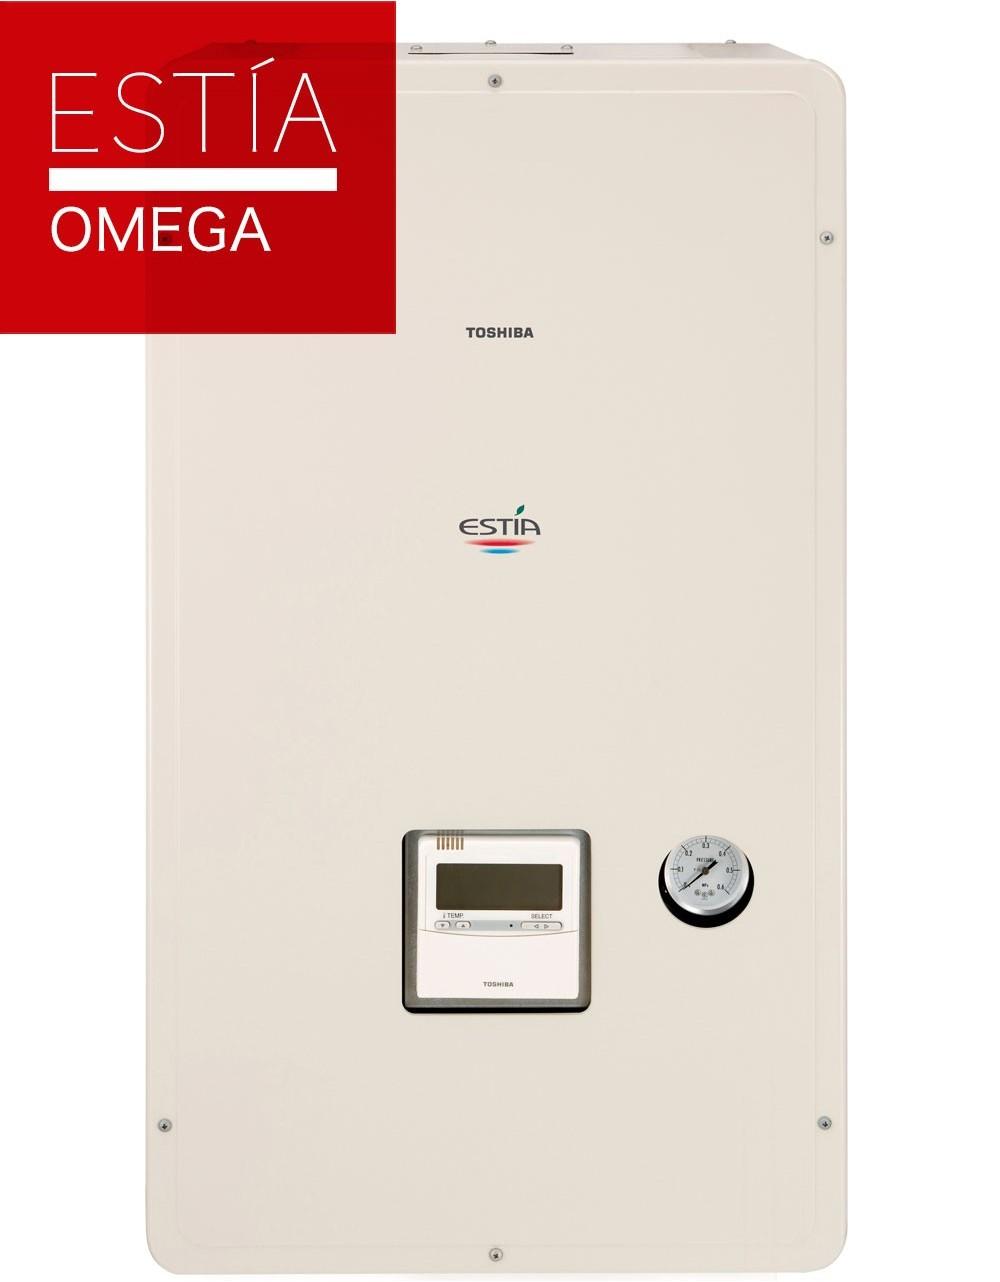 Bomba De Calor Aire Agua Monof Sica Omega Toshiba Aire ~ Calefaccion Bomba De Calor Precio